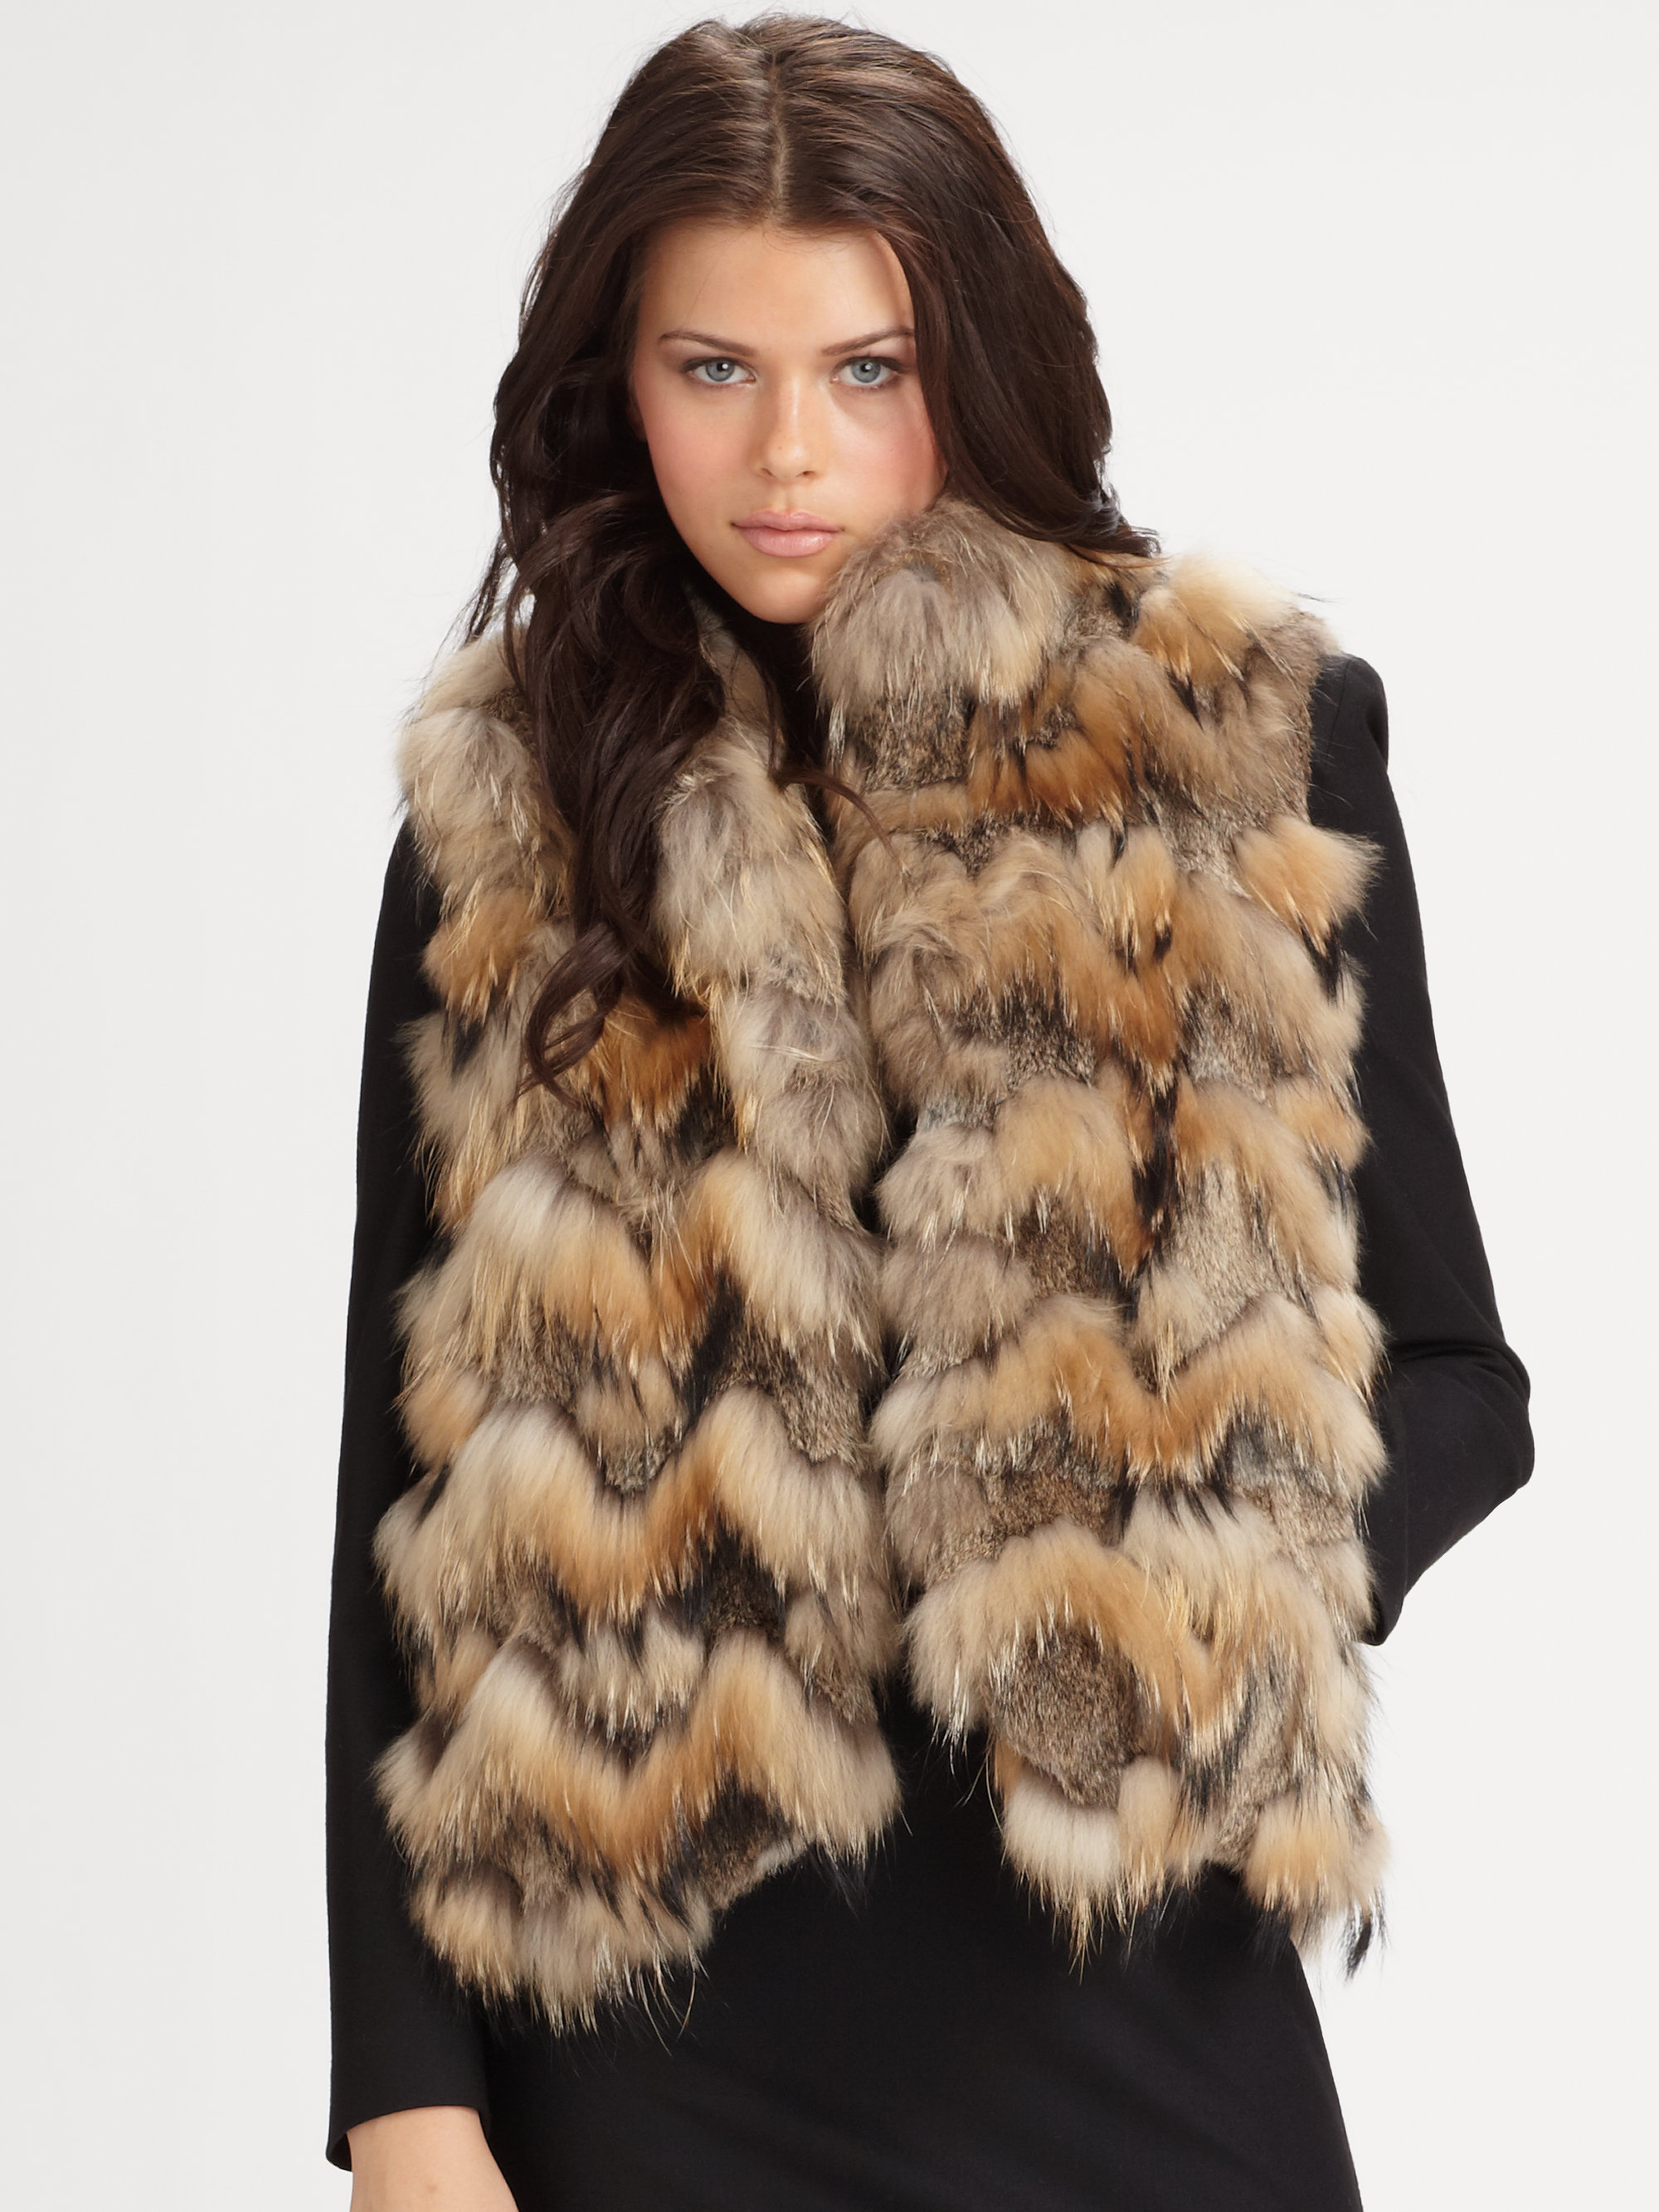 Raccoon vest theory martin jensen bjert investment